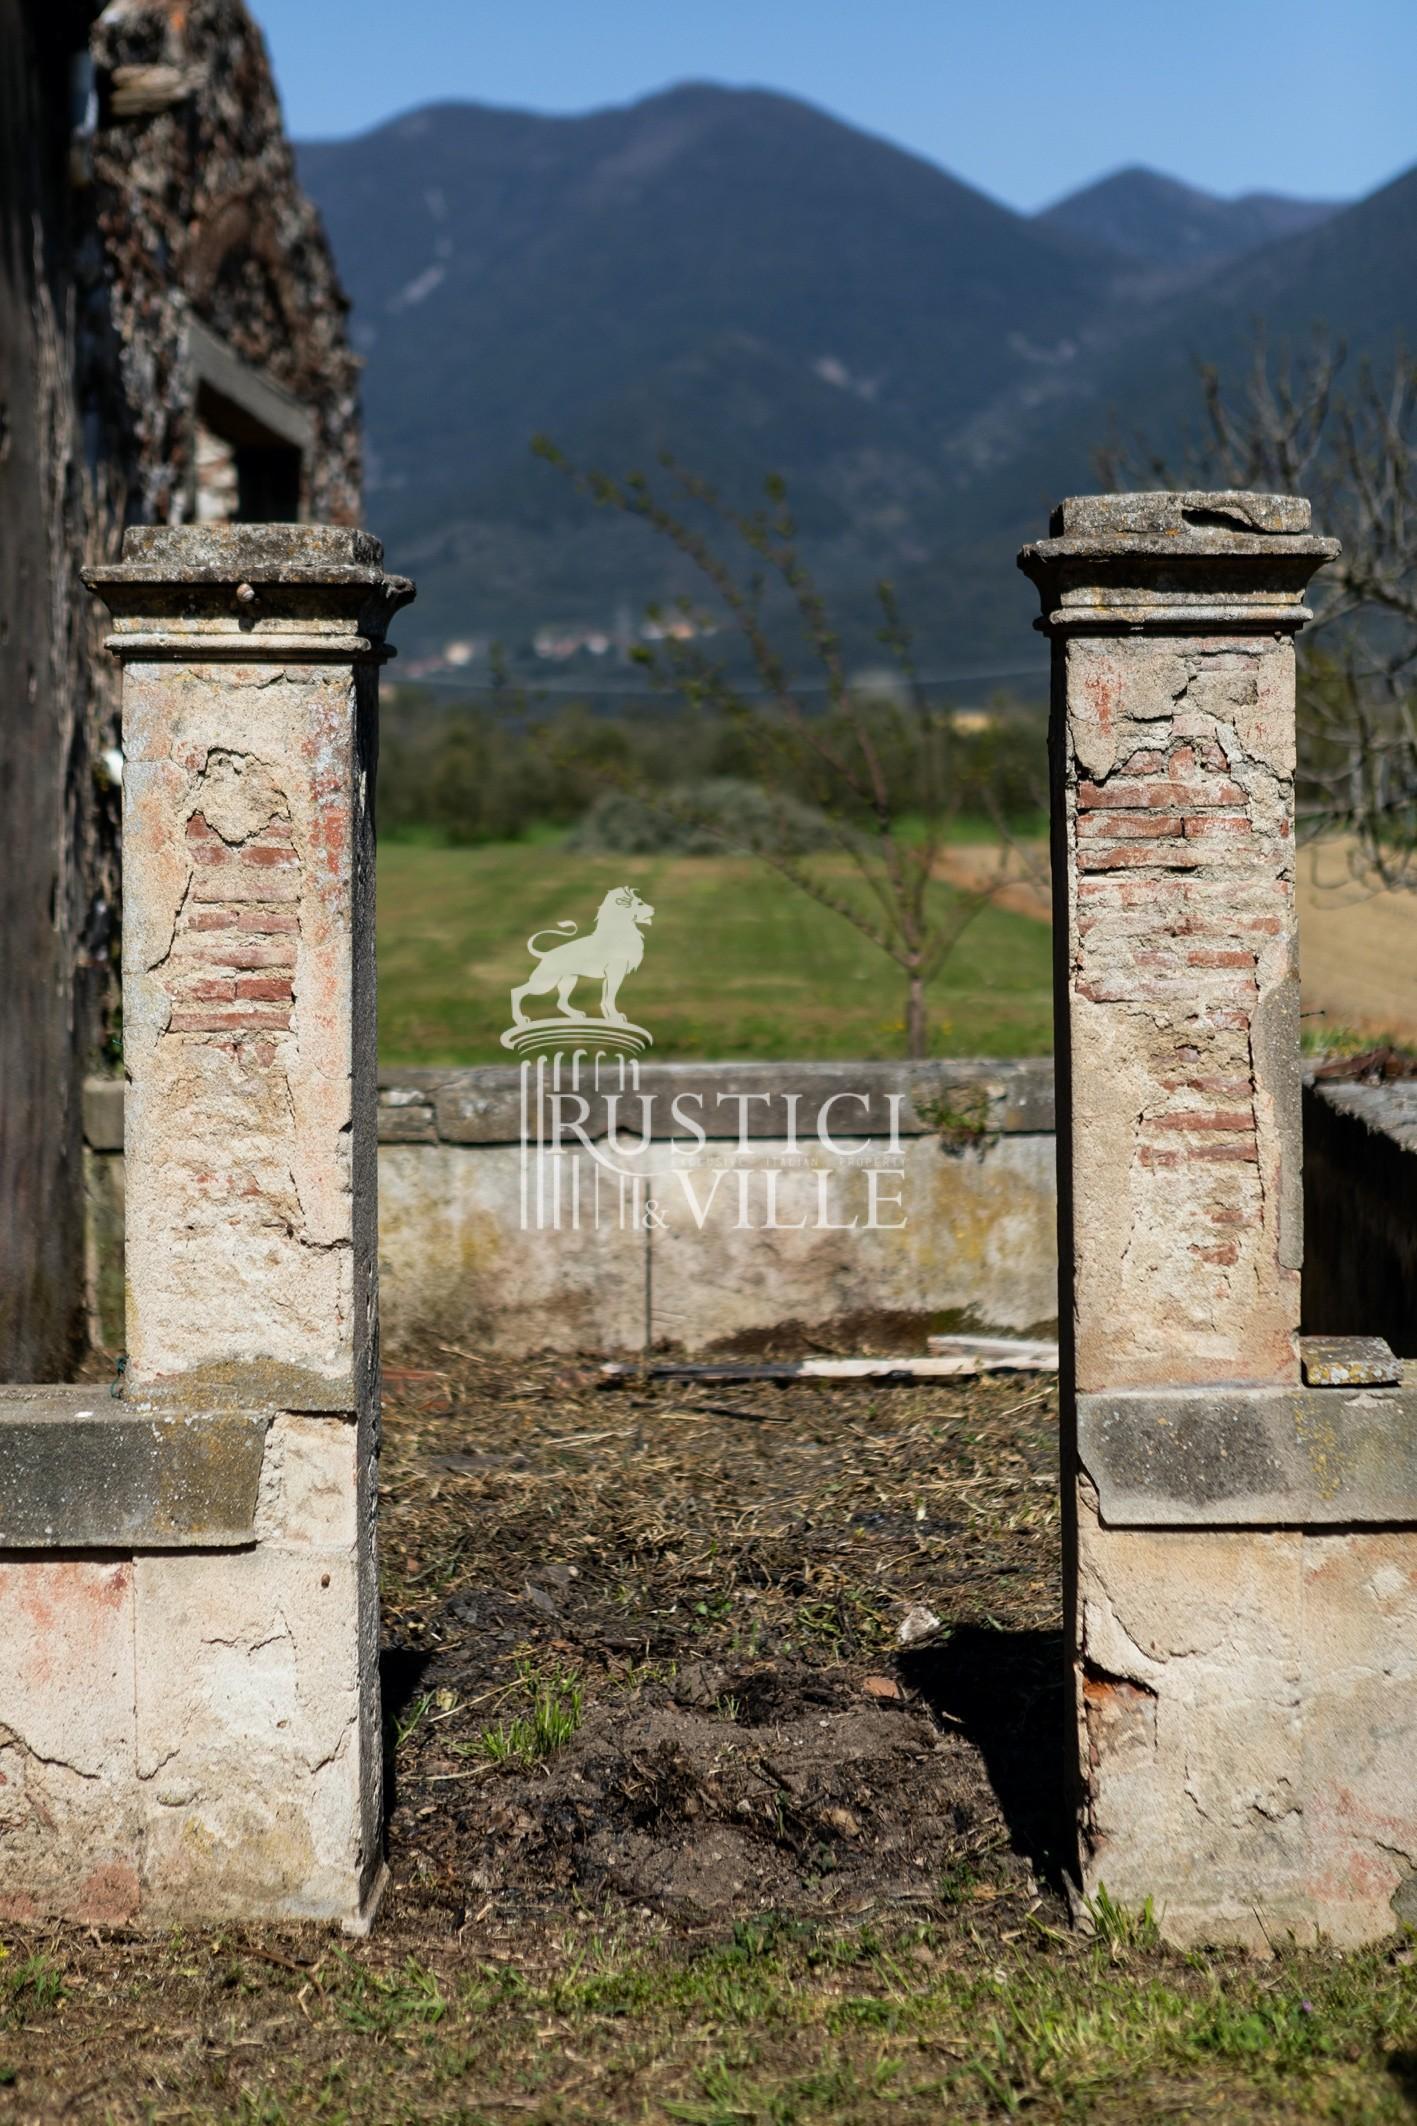 Edificio storico in vendita a San Giuliano Terme (80/81)